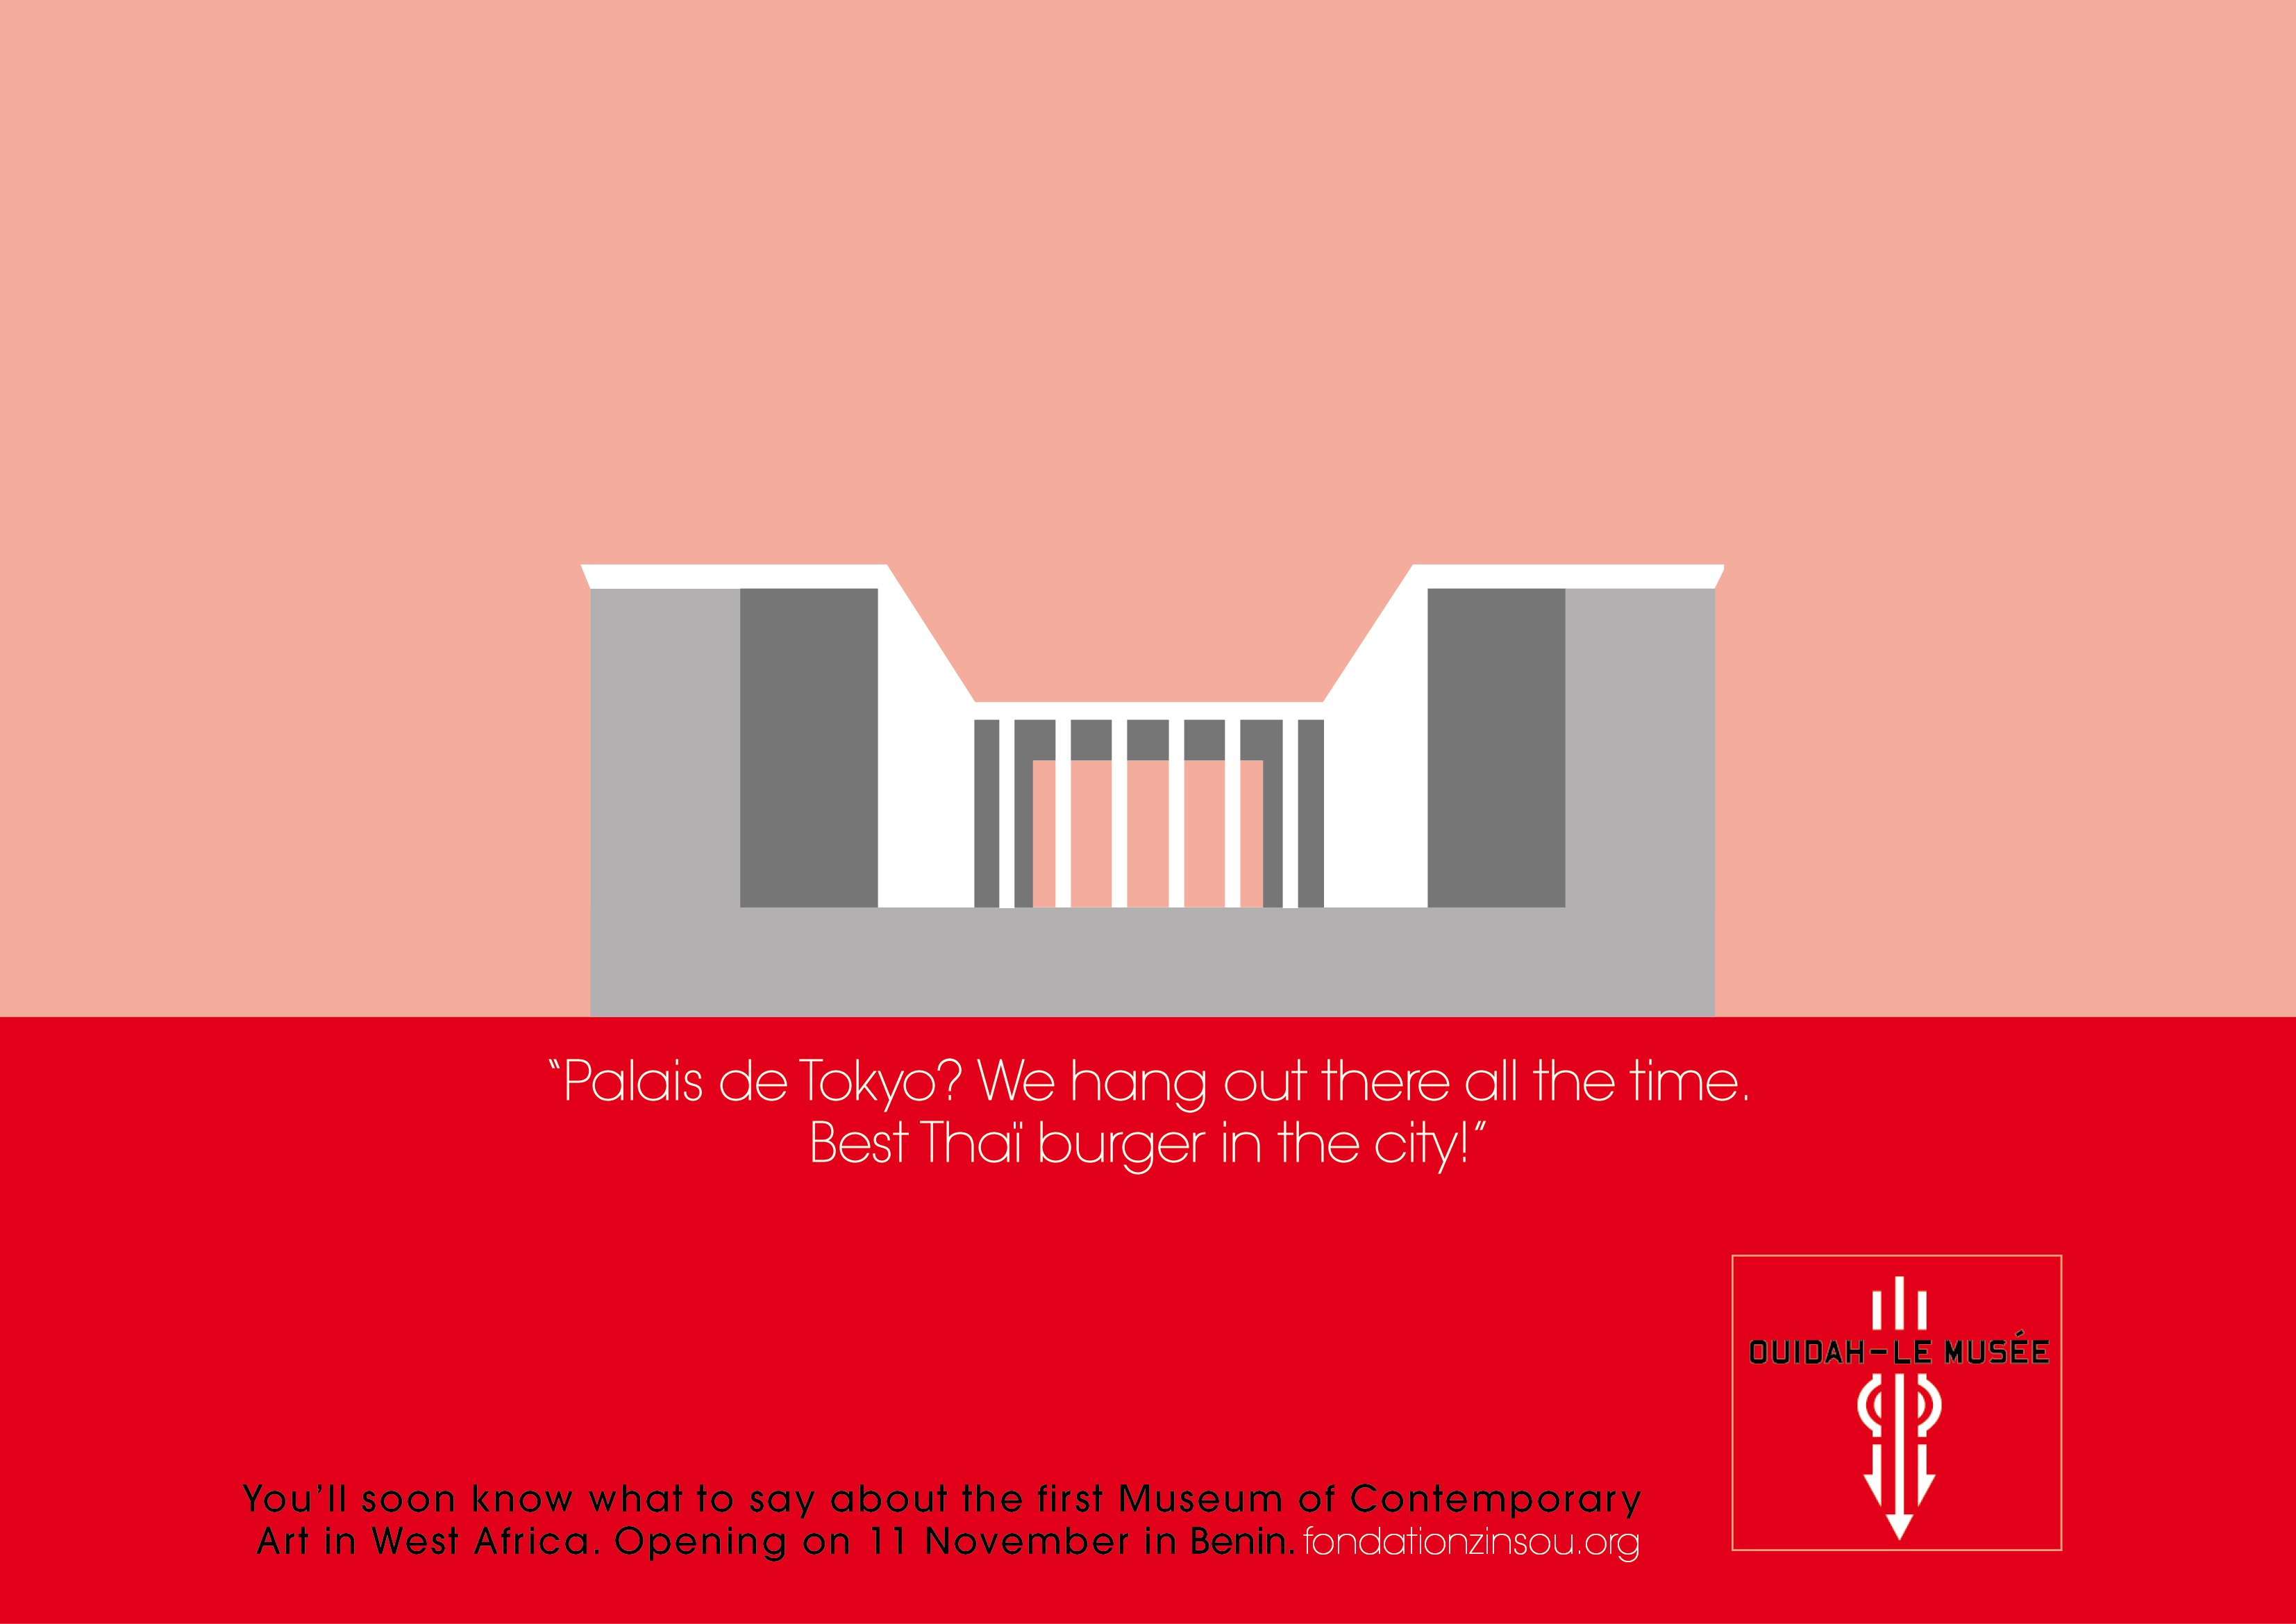 ouidah-museum-palais-de-tokyo-2000-56003